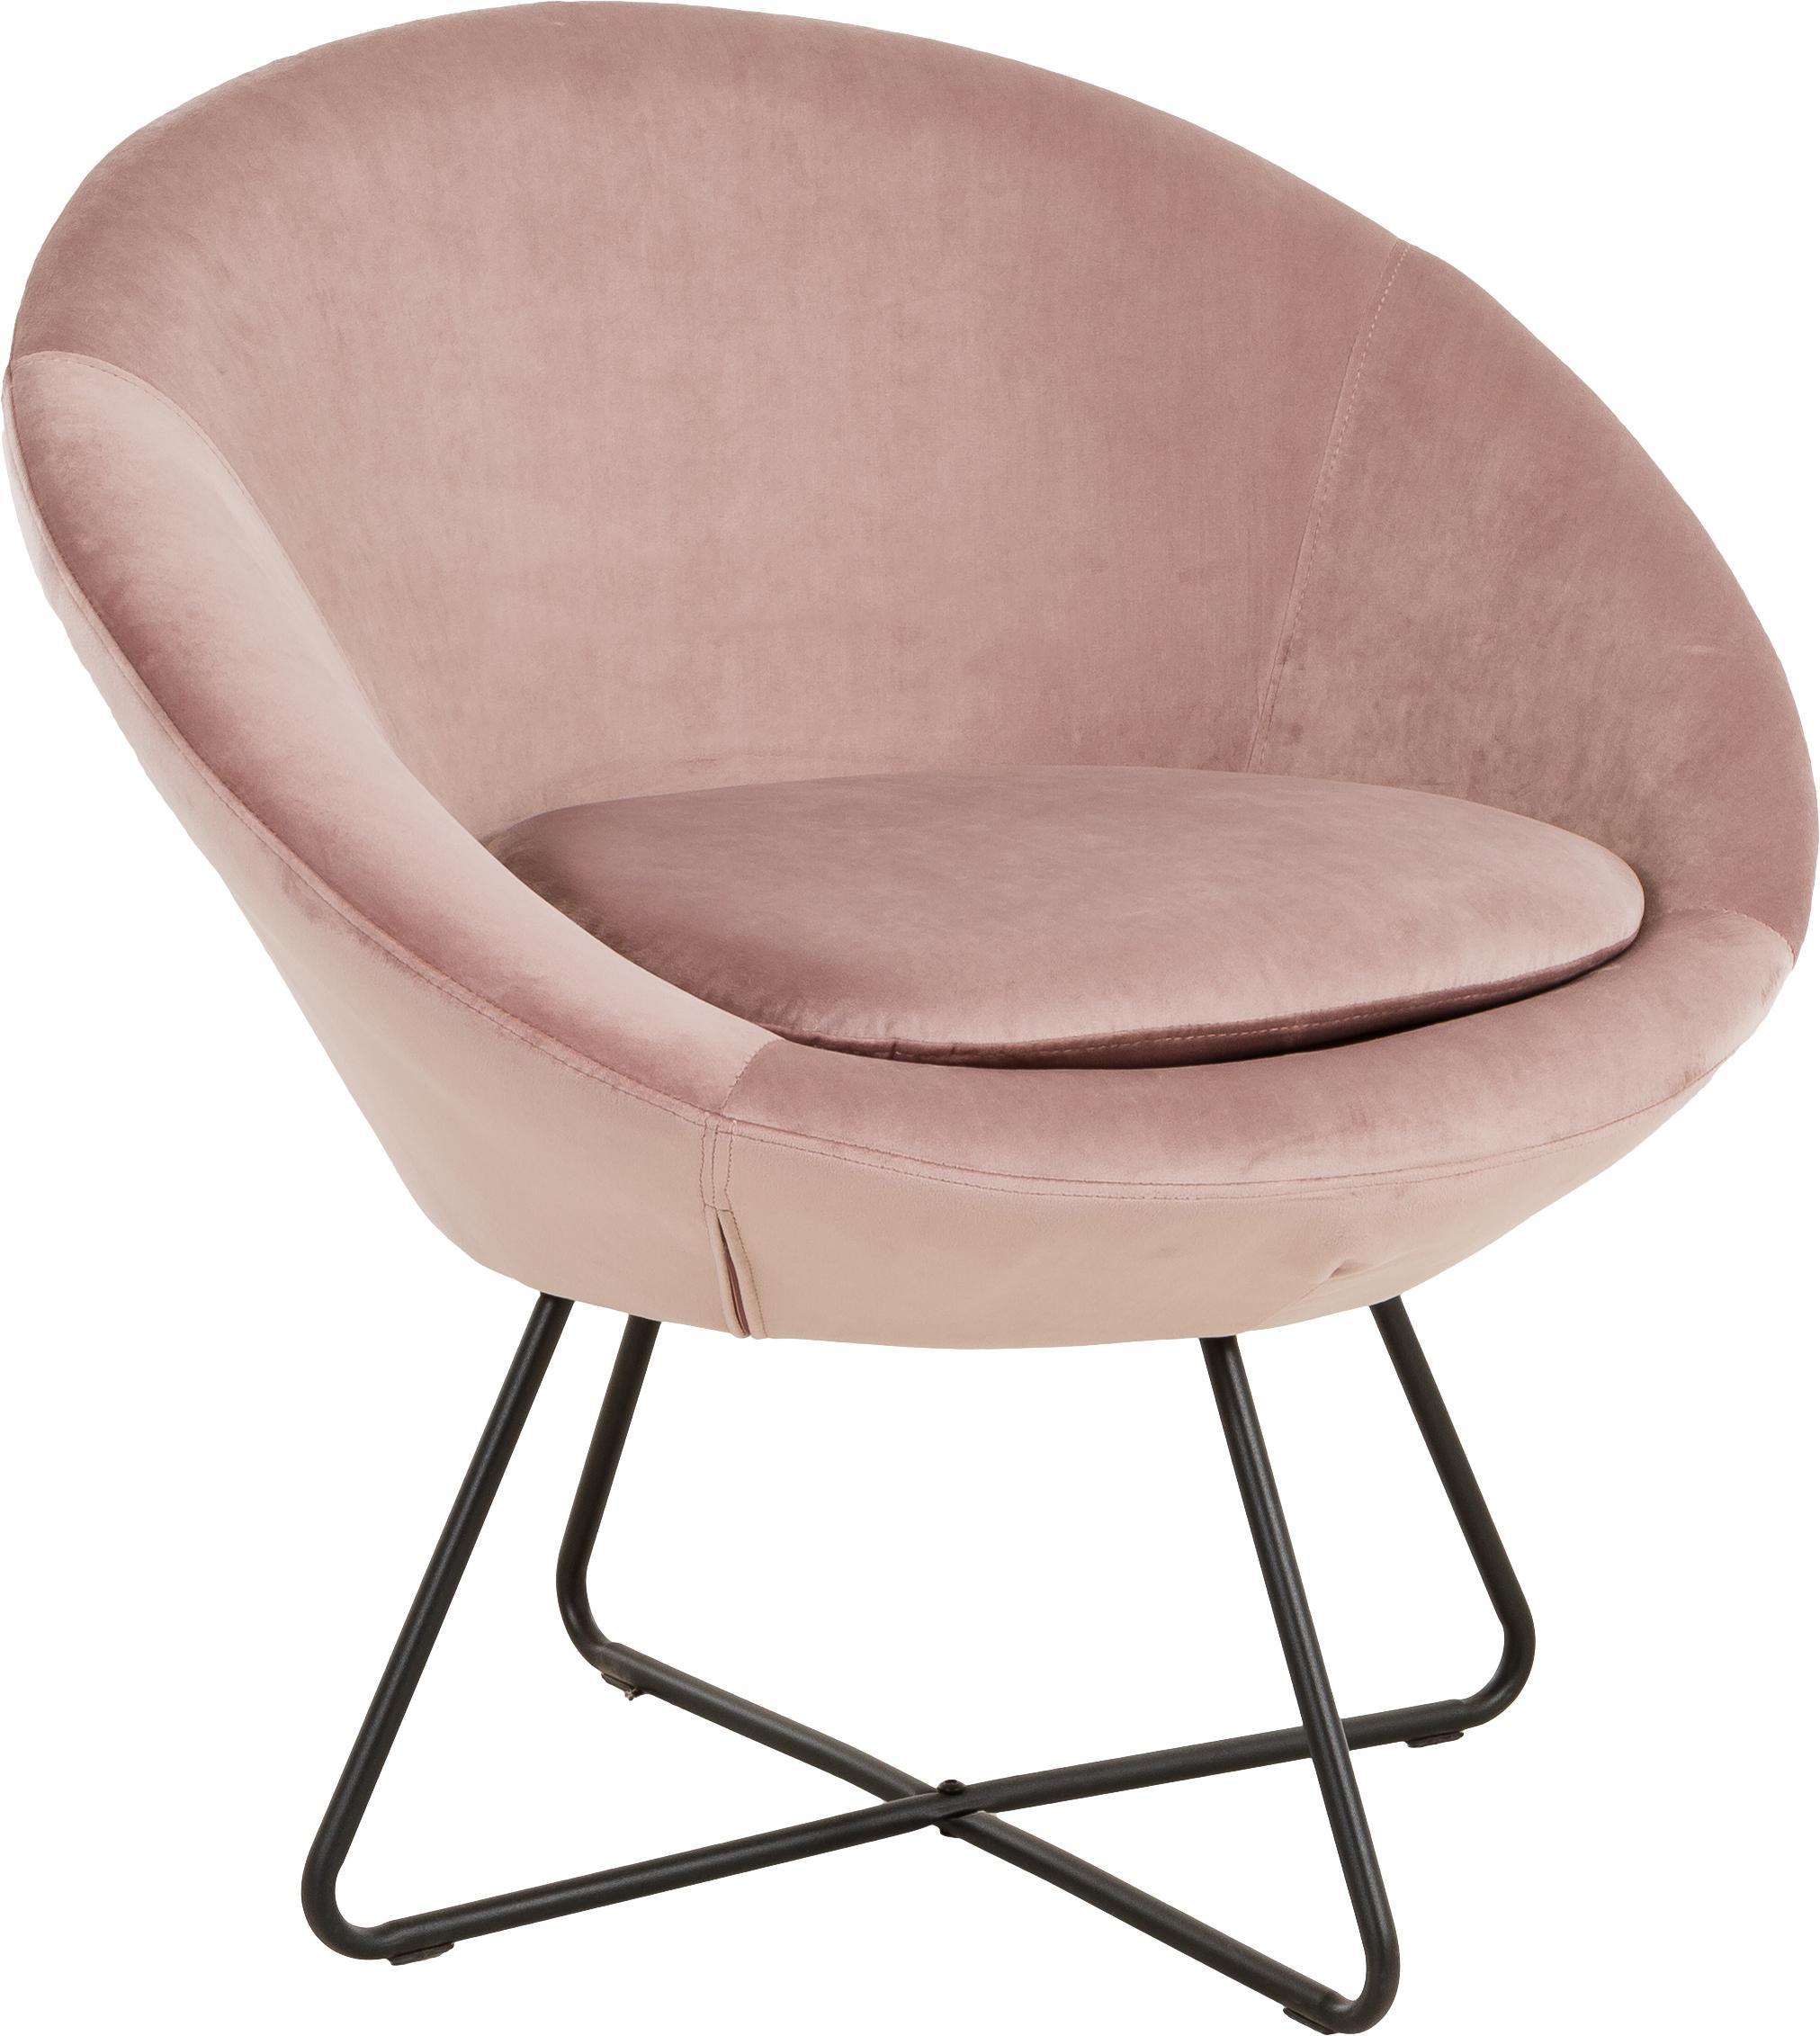 Fluwelen fauteuil Center in oudroze, Bekleding: polyester fluweel, Poten: ruw gepoedercoat metaal, Fluweel oudroze, B 82 x D 73 cm